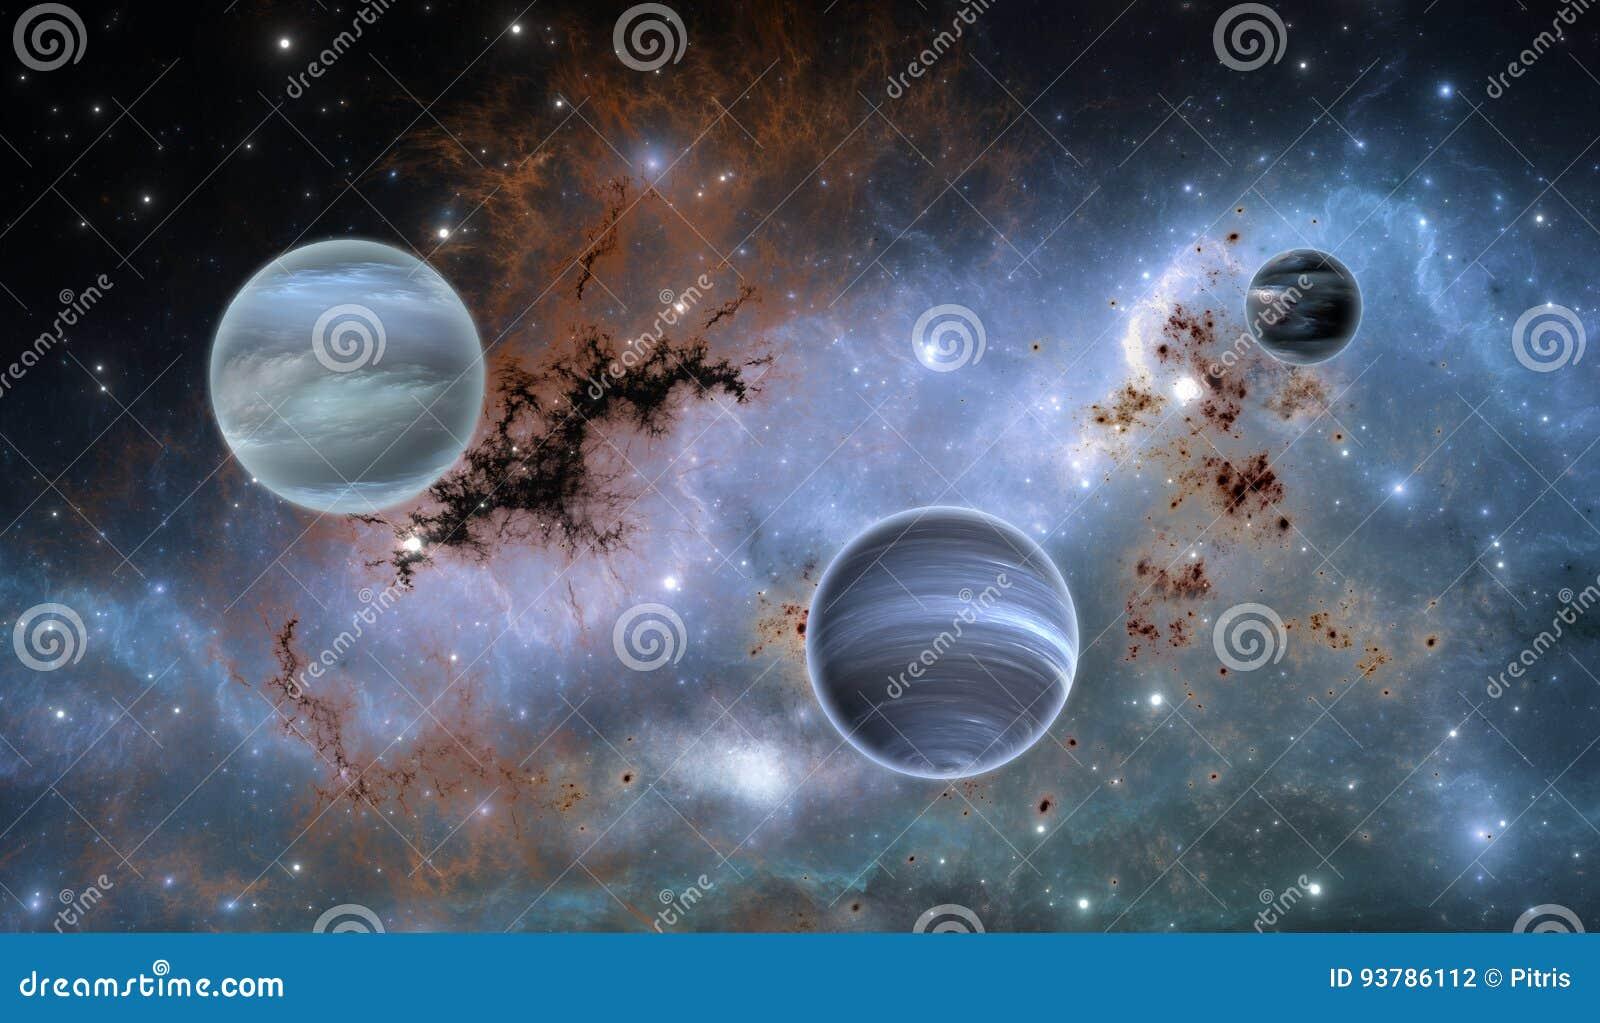 Exoplanets ou planetas Extrasolar na nebulosa do fundo